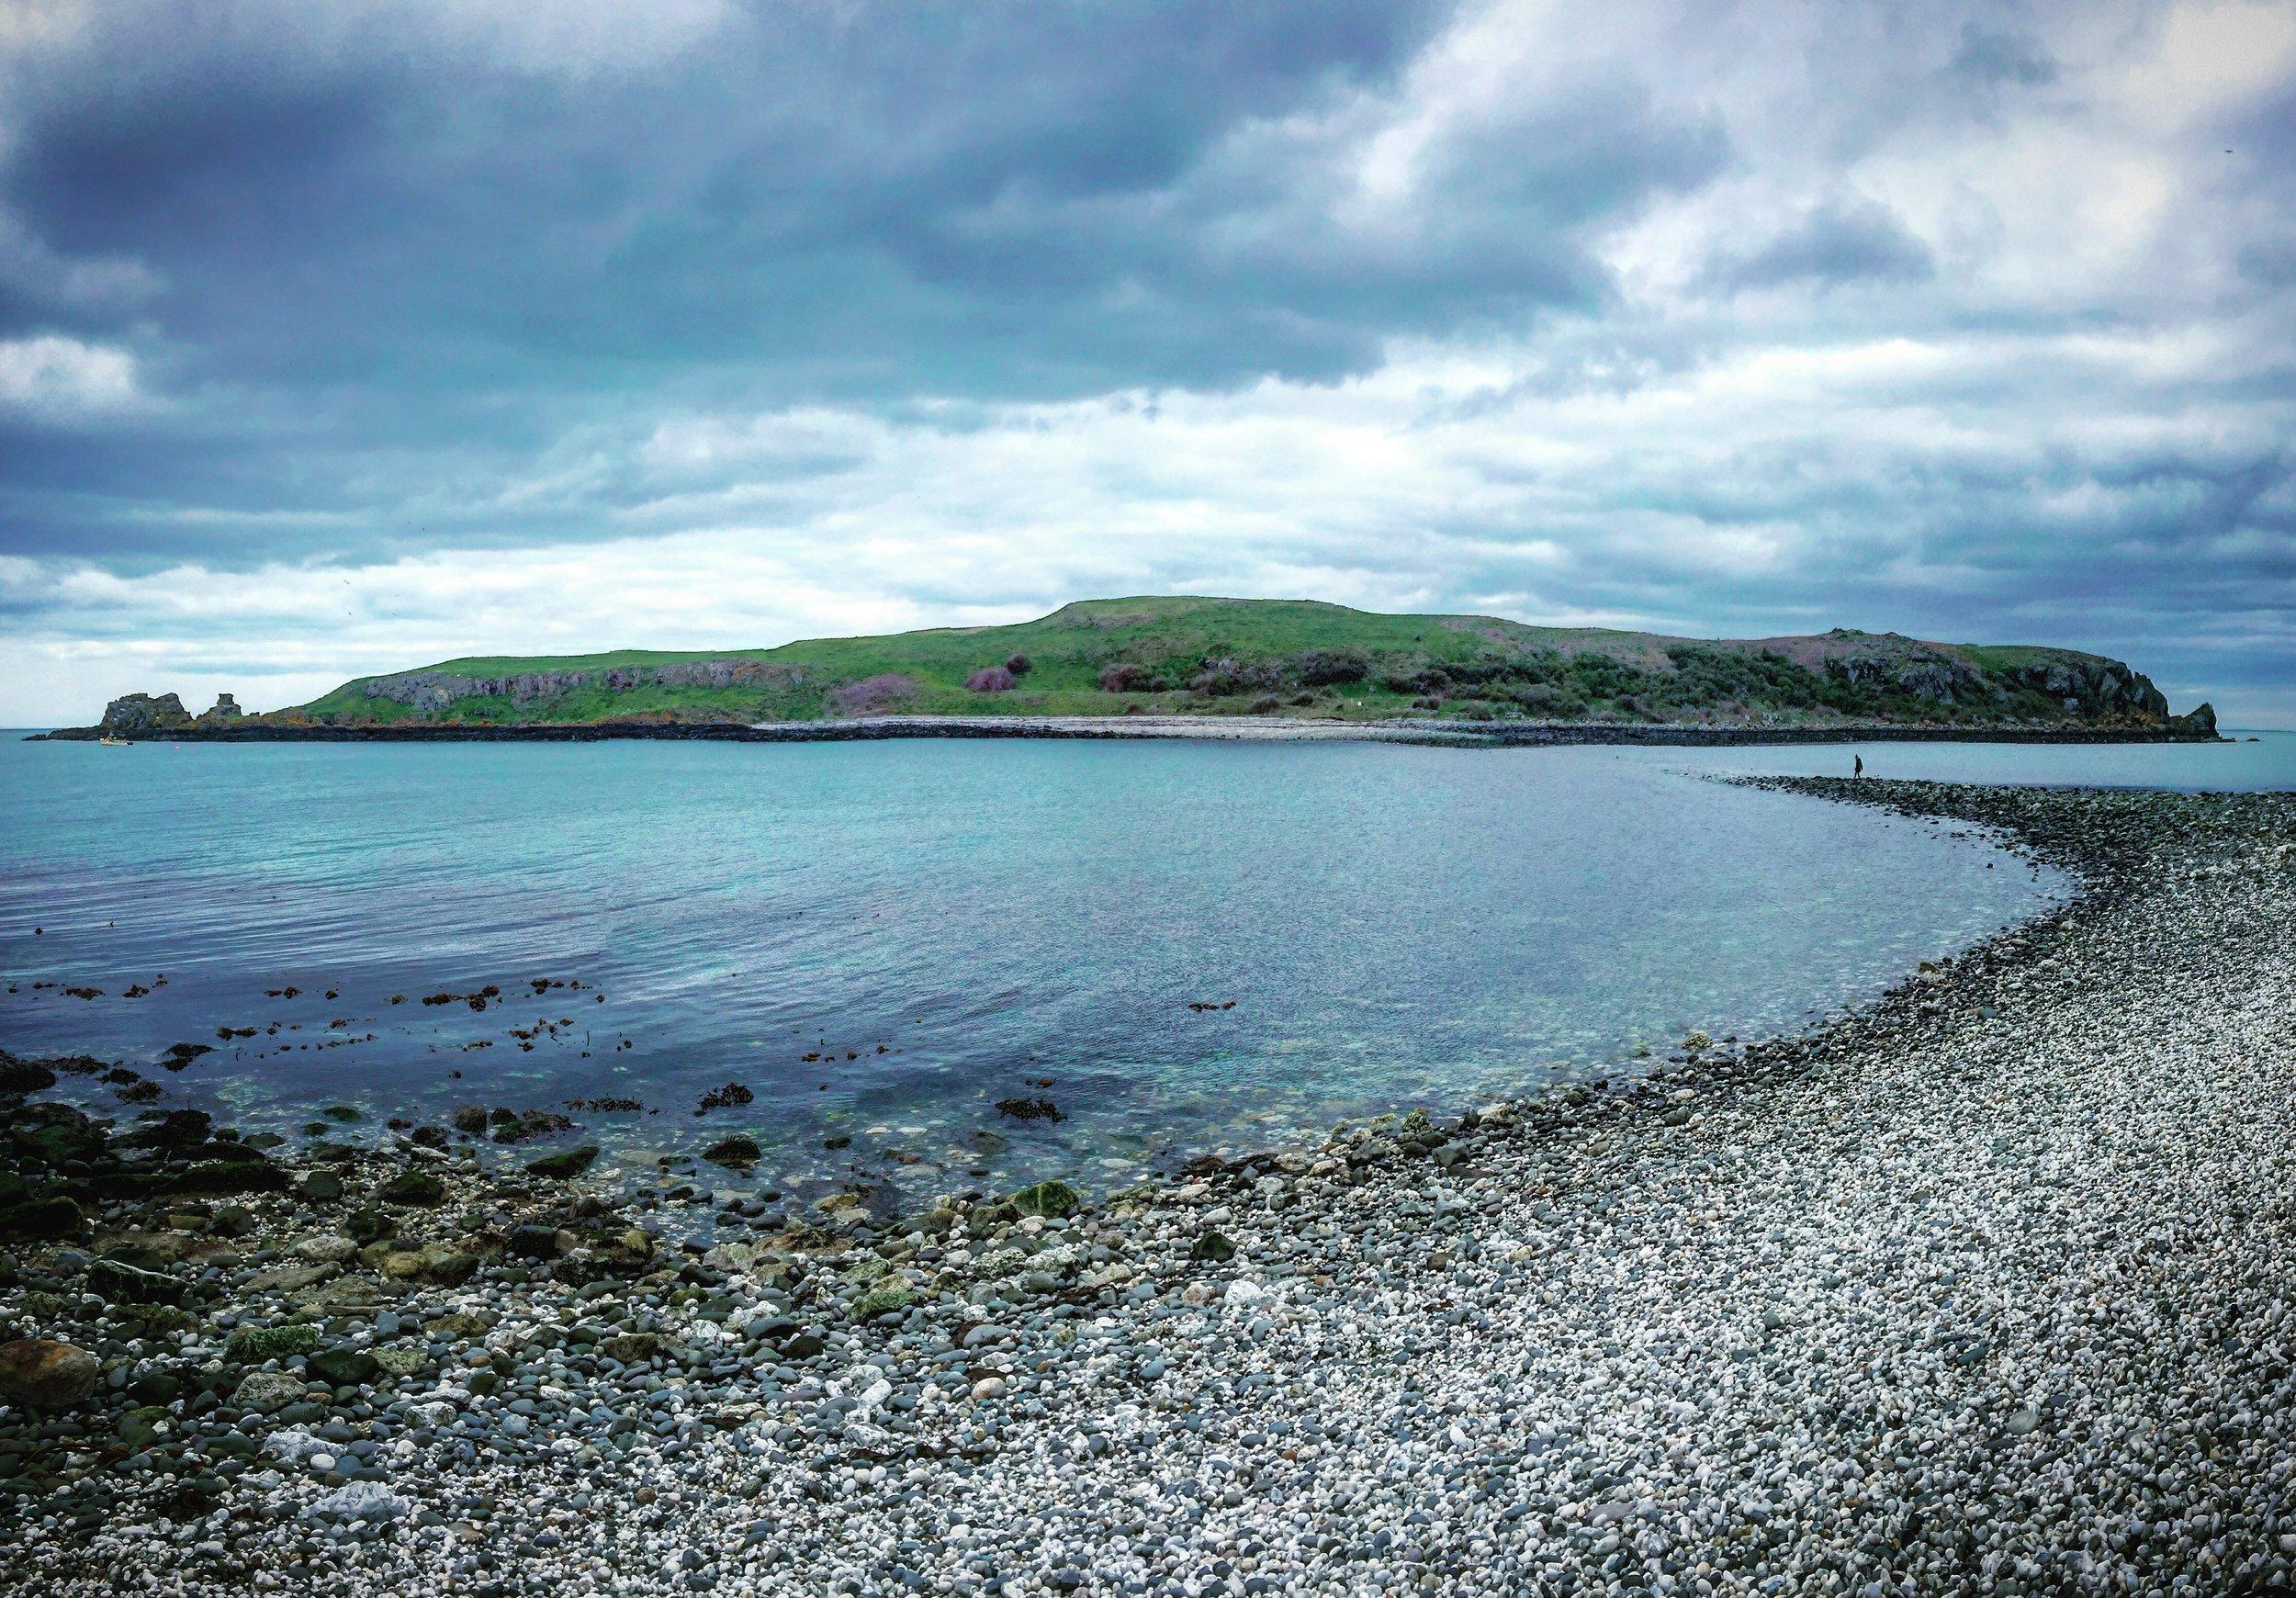 panoramic_muck_island_portmuck_harbour_islandmagee_antrim_roadtrip_coast_ni_explorer_niexplorer_northern_ireland_blog.jpg